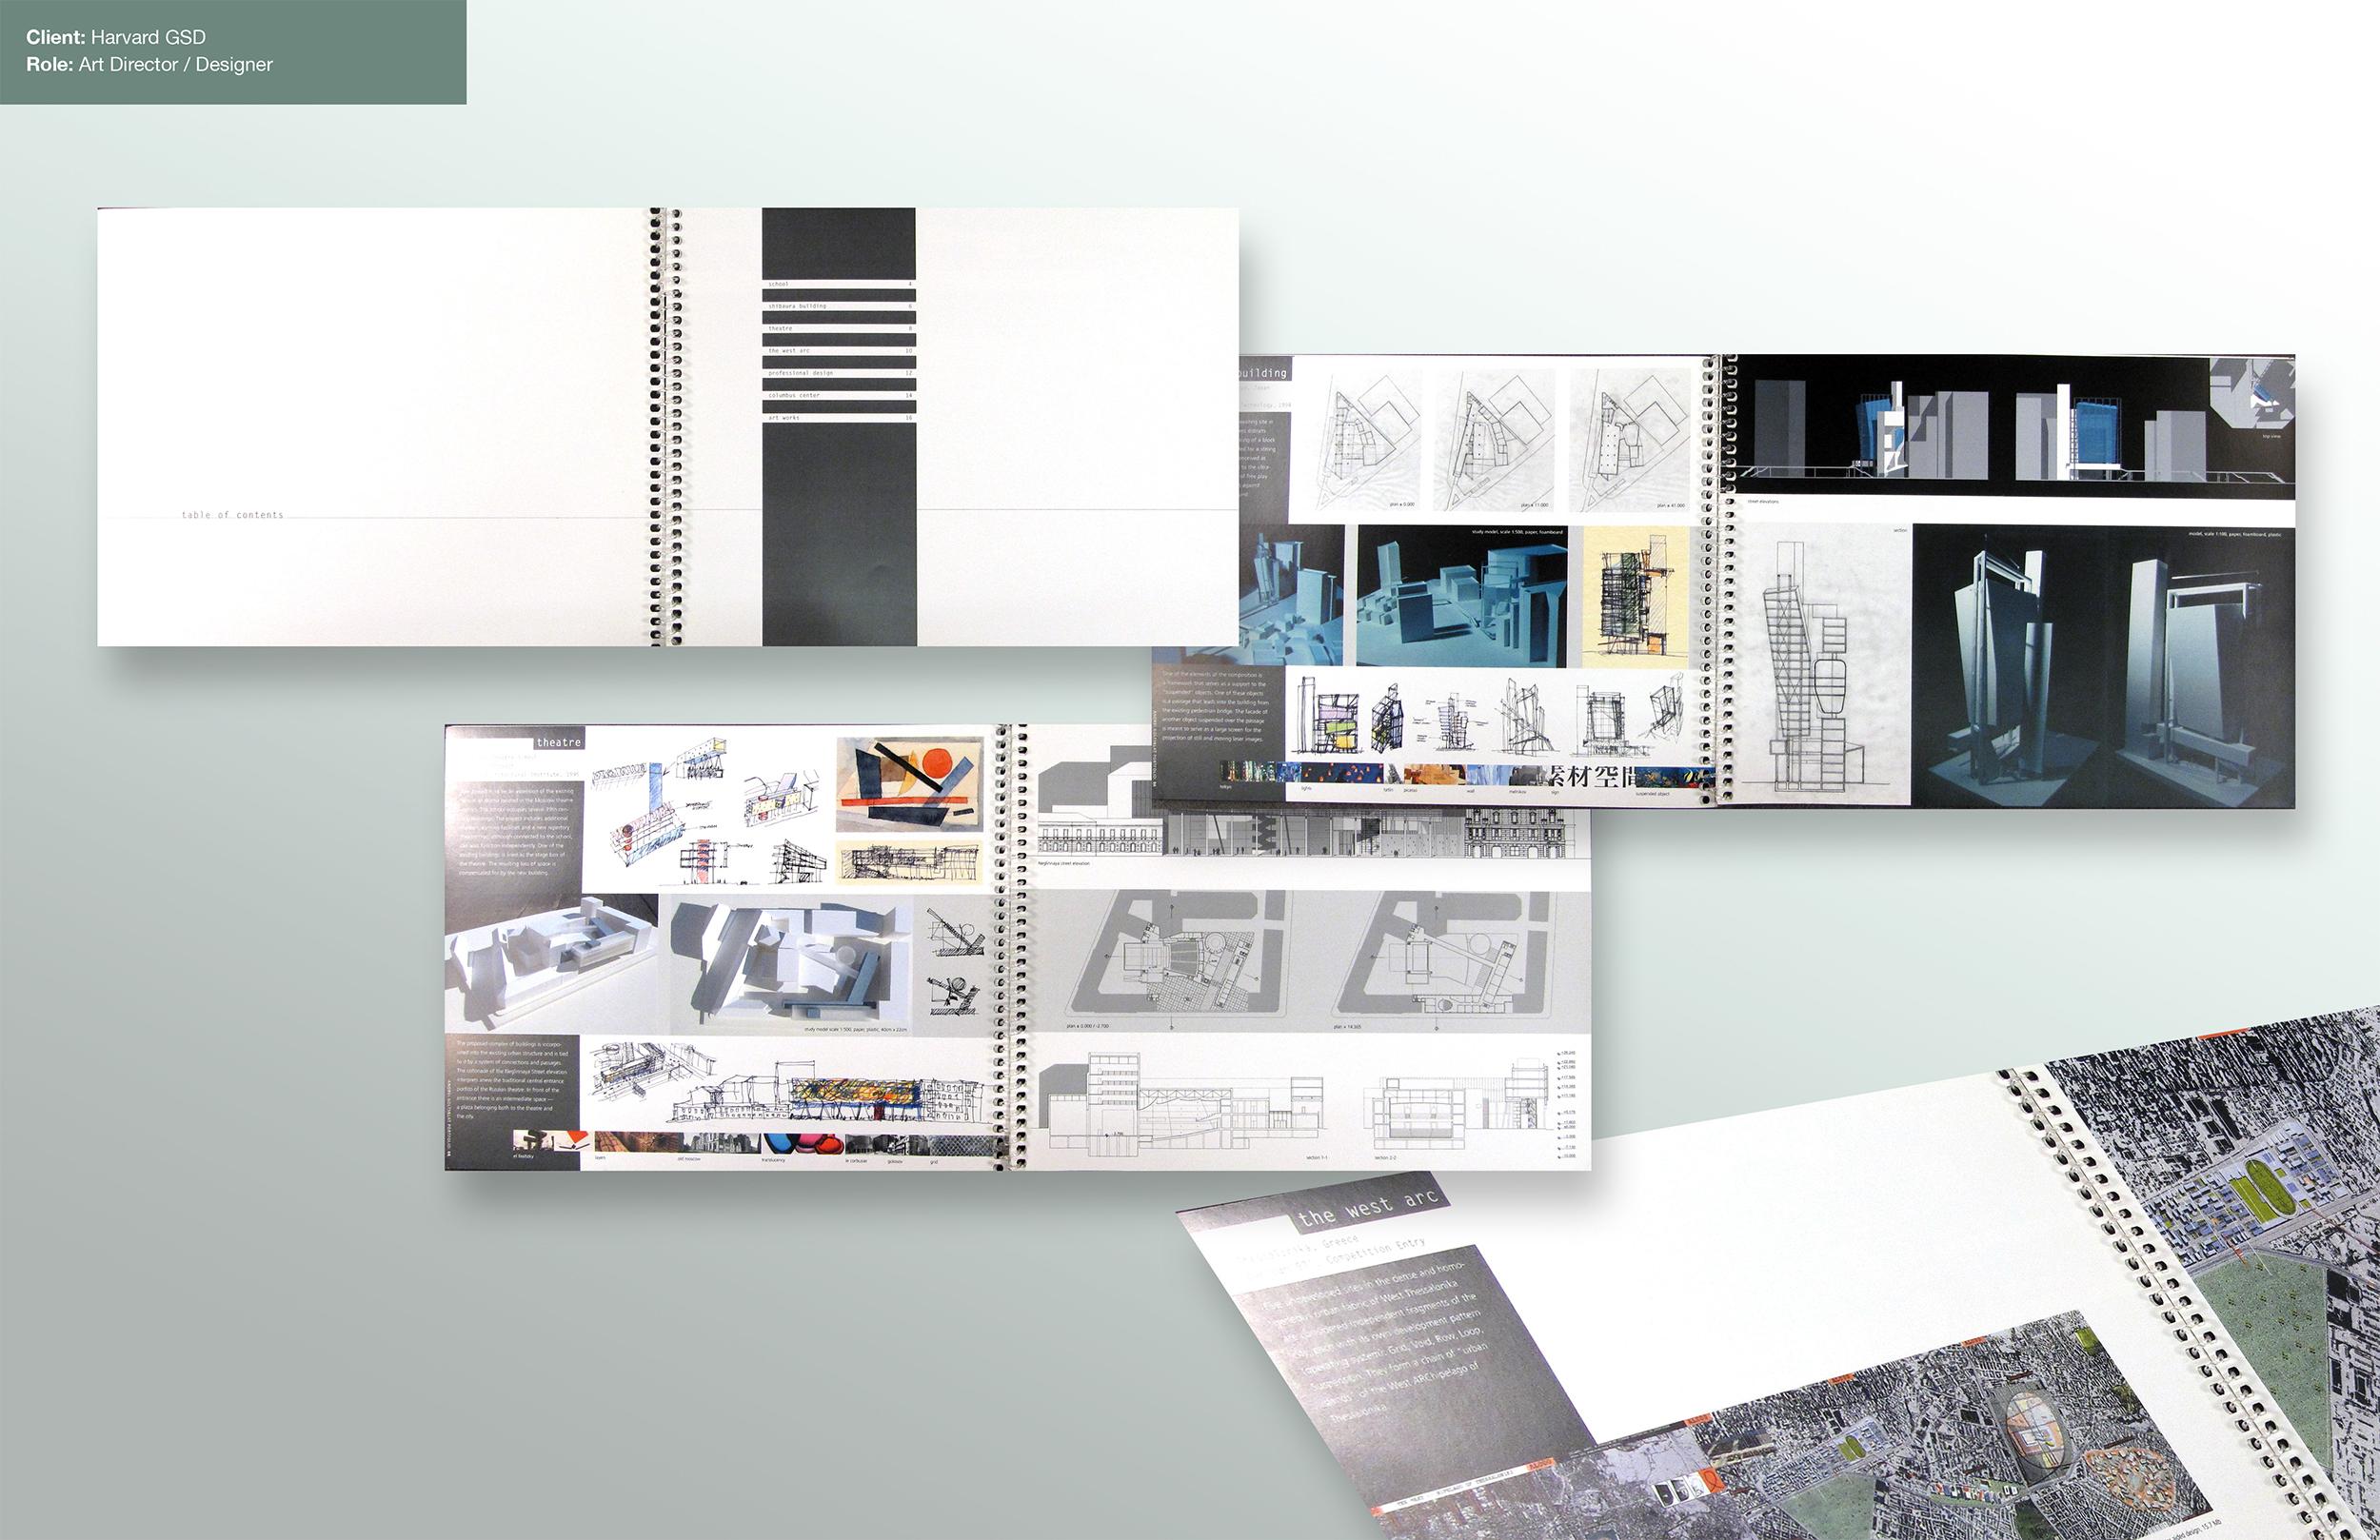 Portfolio design for GSD, Harvard.